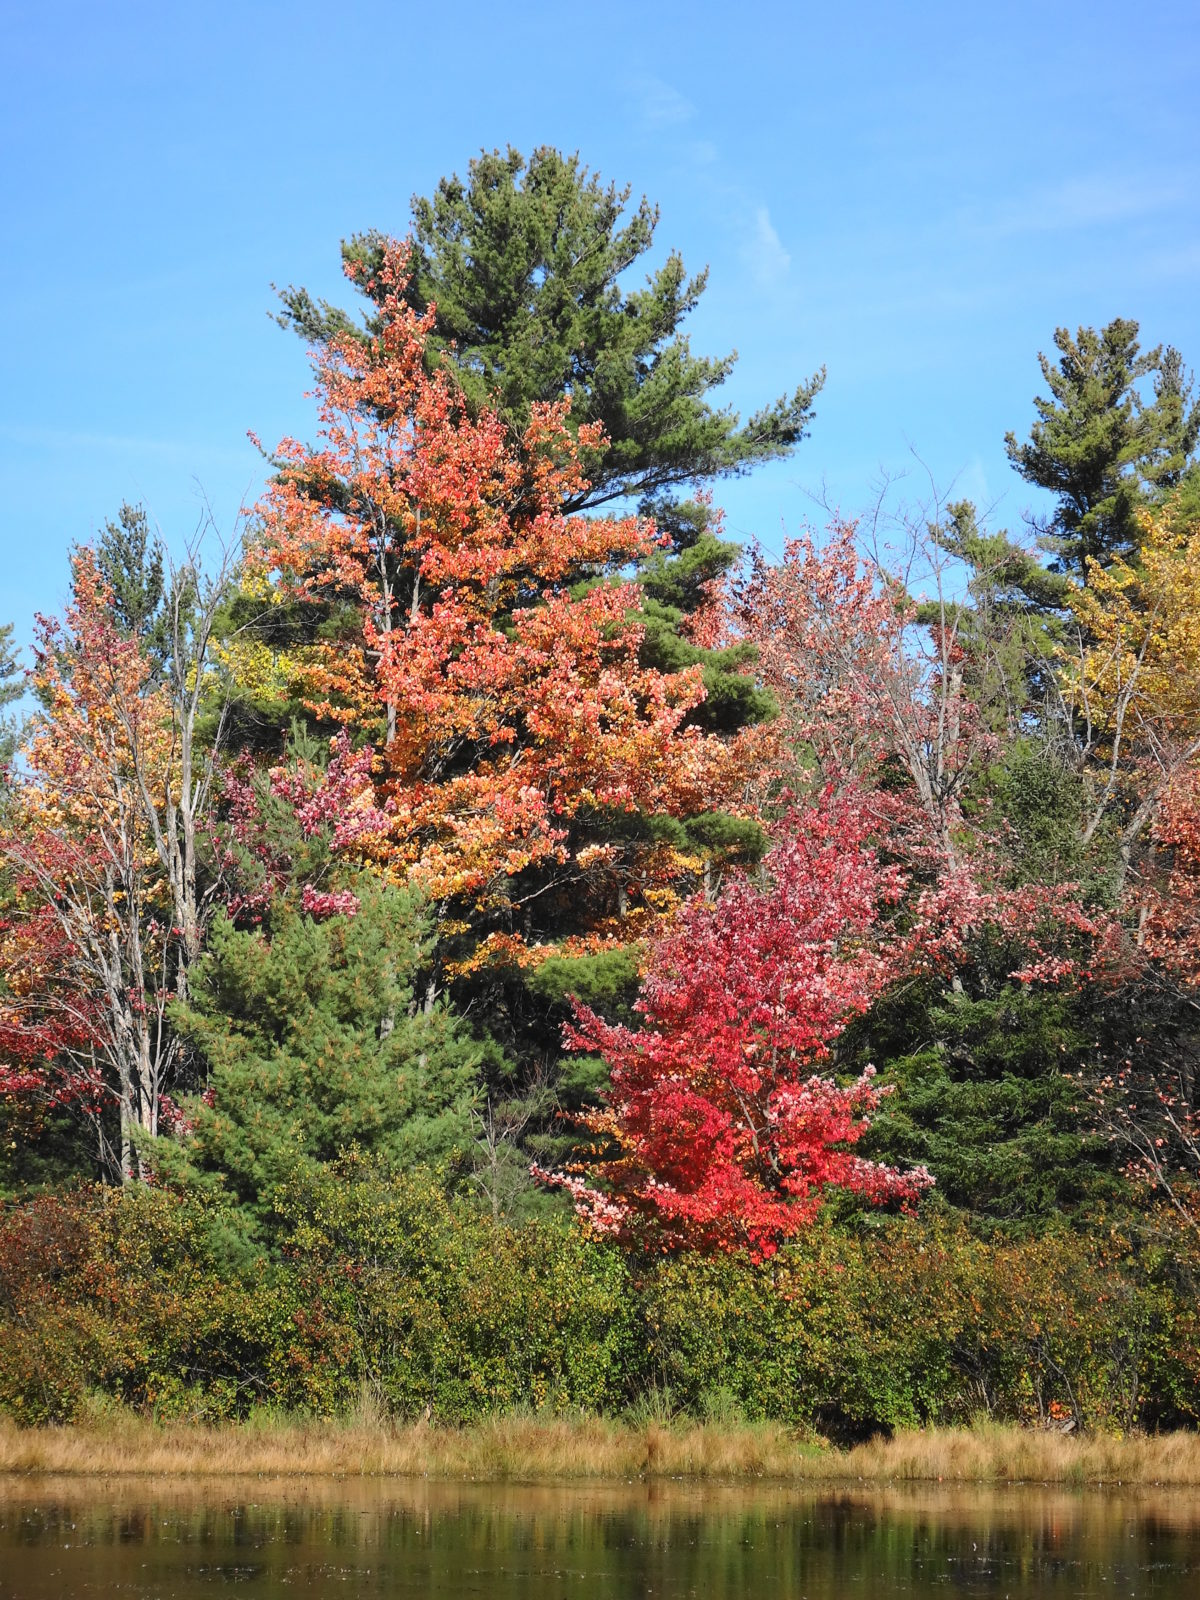 Red maple trees blaze across a wetland.